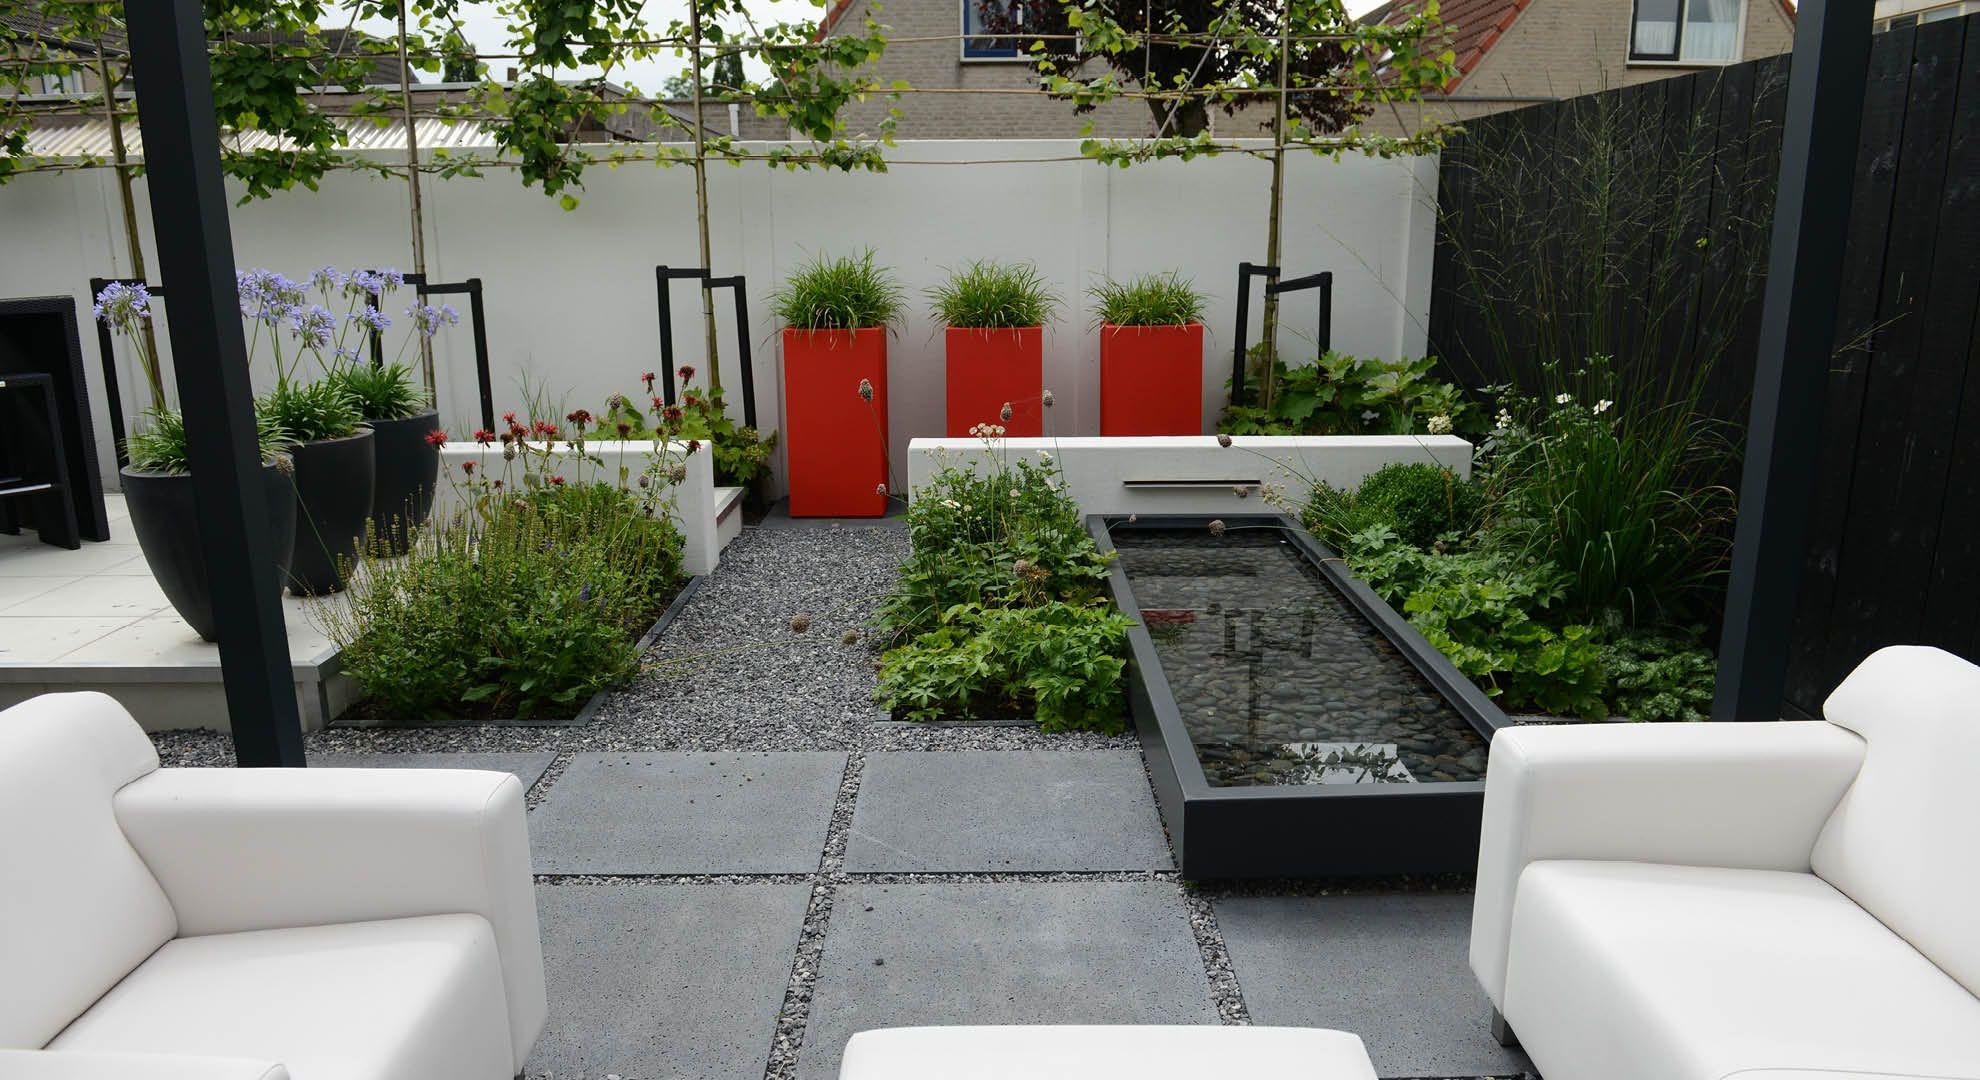 Moderne onderhoudsvriendelijke achtertuin foto 2 tuin pinterest onderhoudsvriendelijke - Moderne tuin foto ...